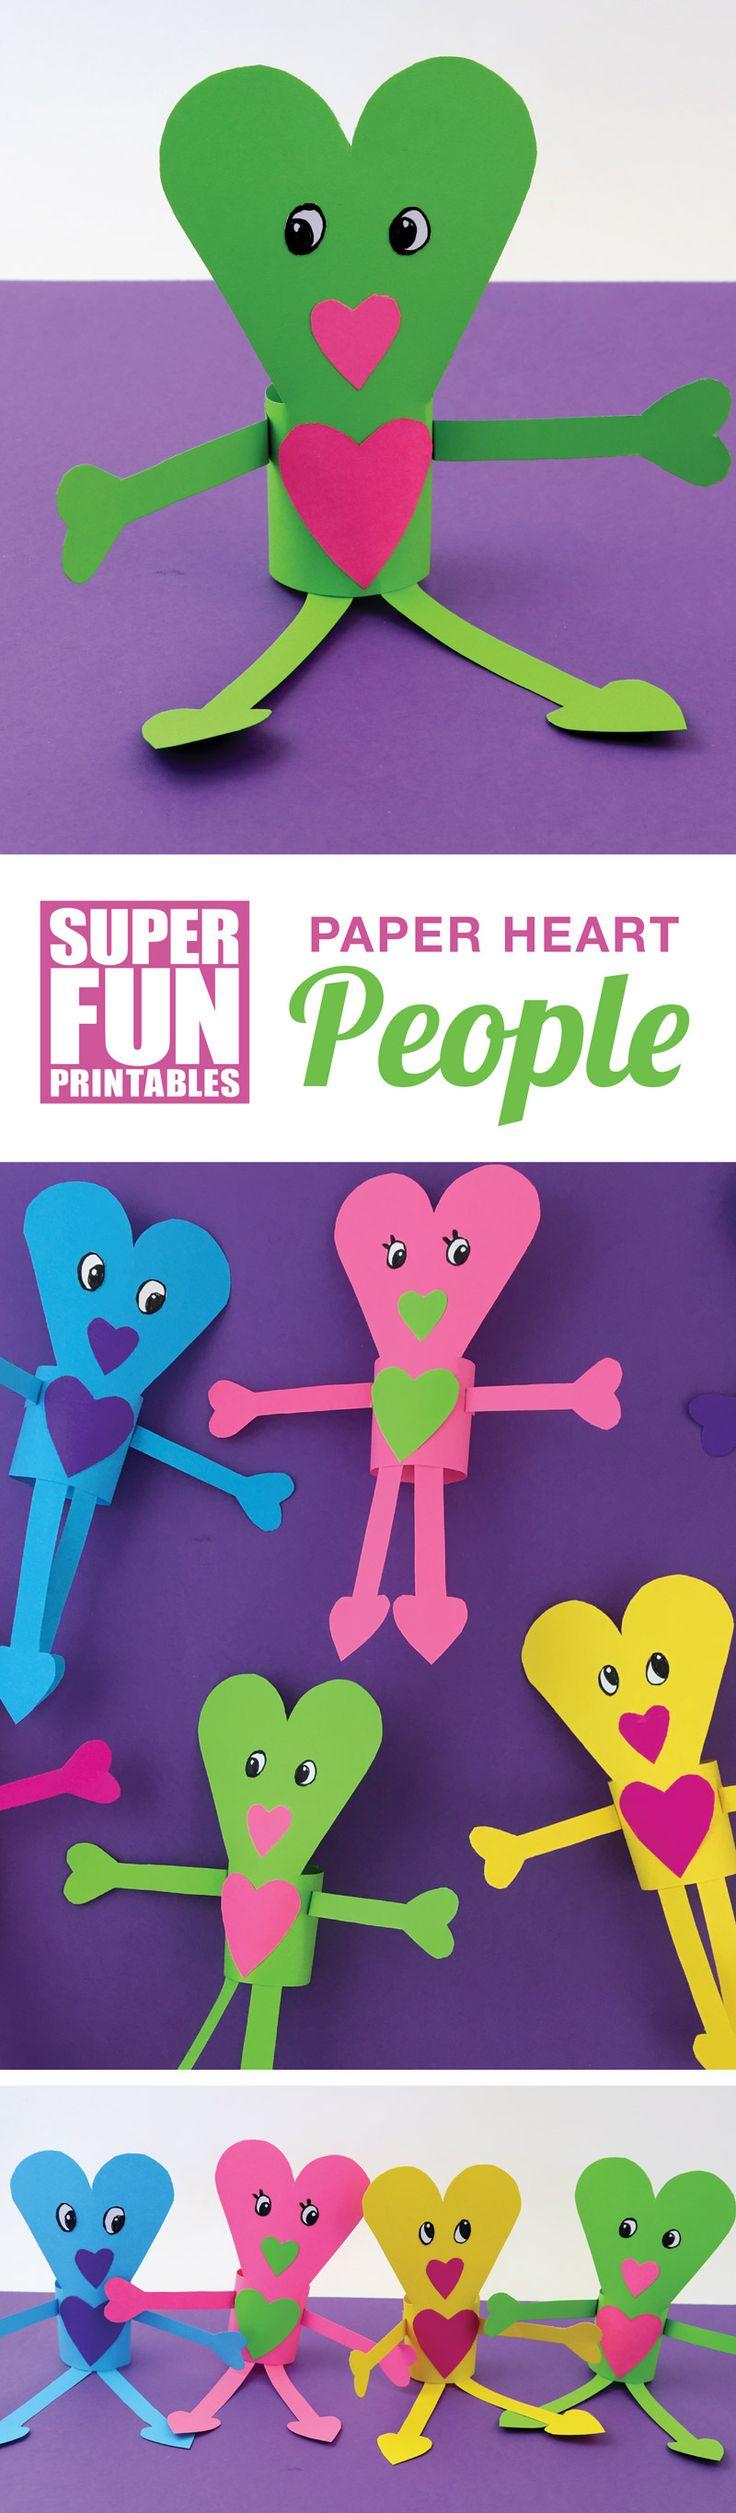 Paper heart people